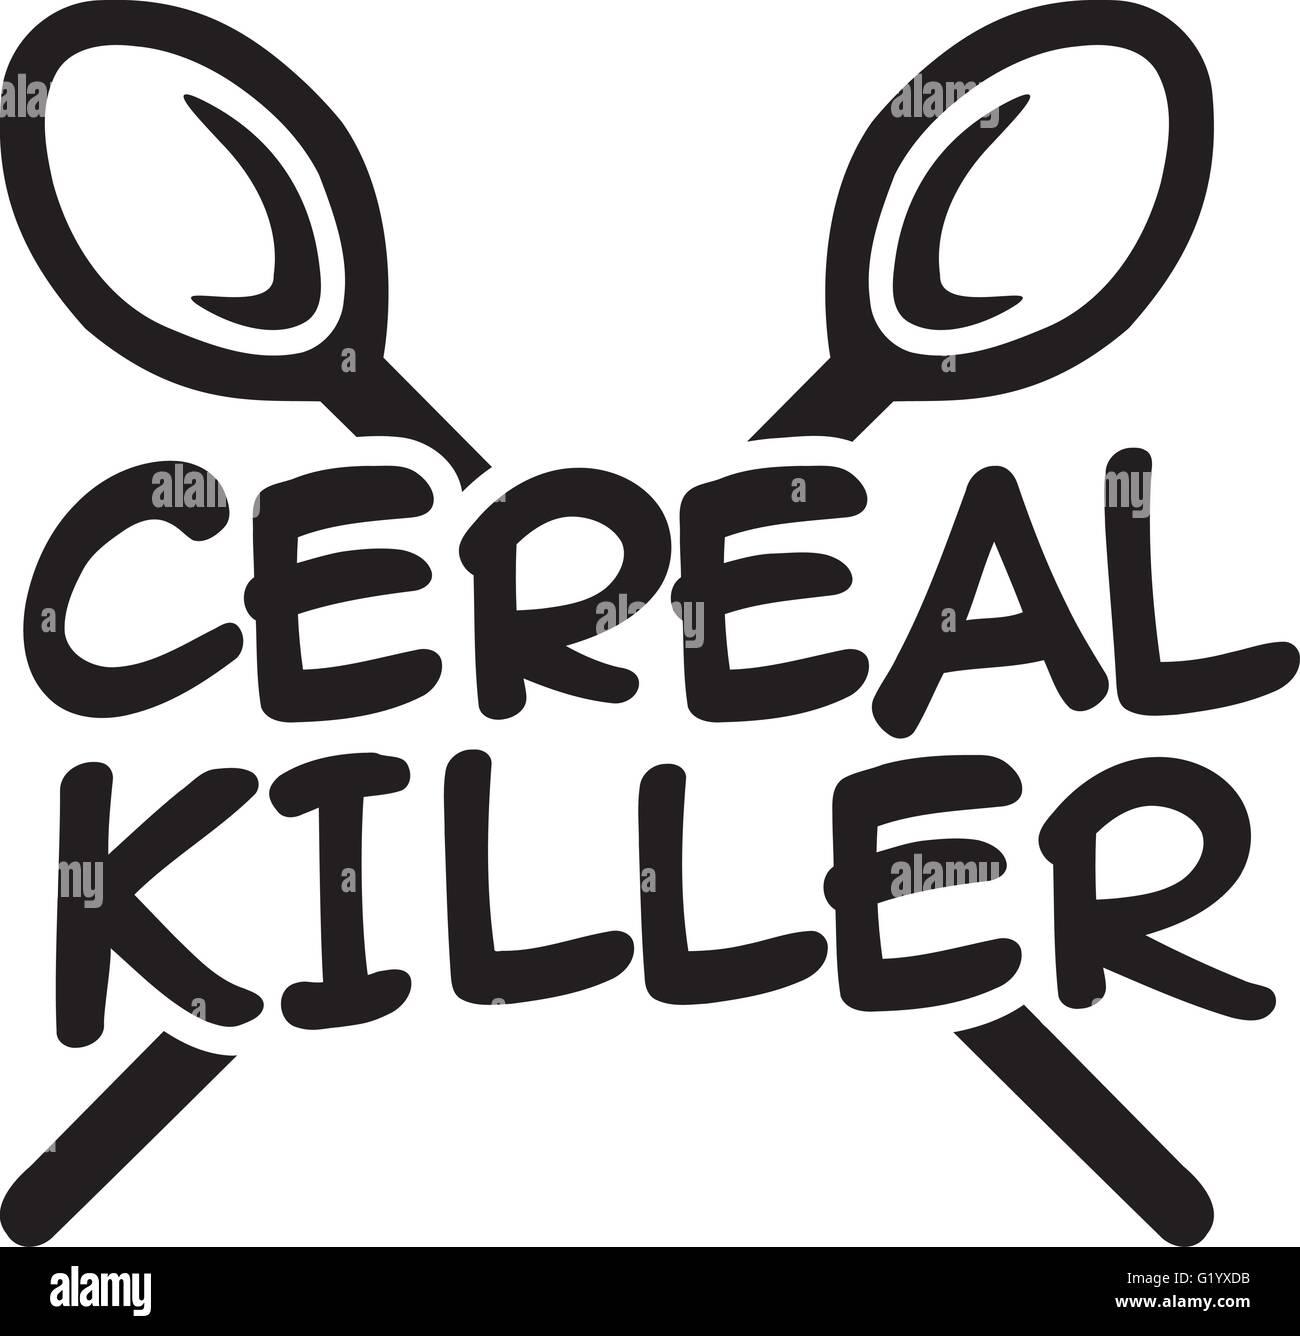 Cereal Killer mit Löffel Stockbild